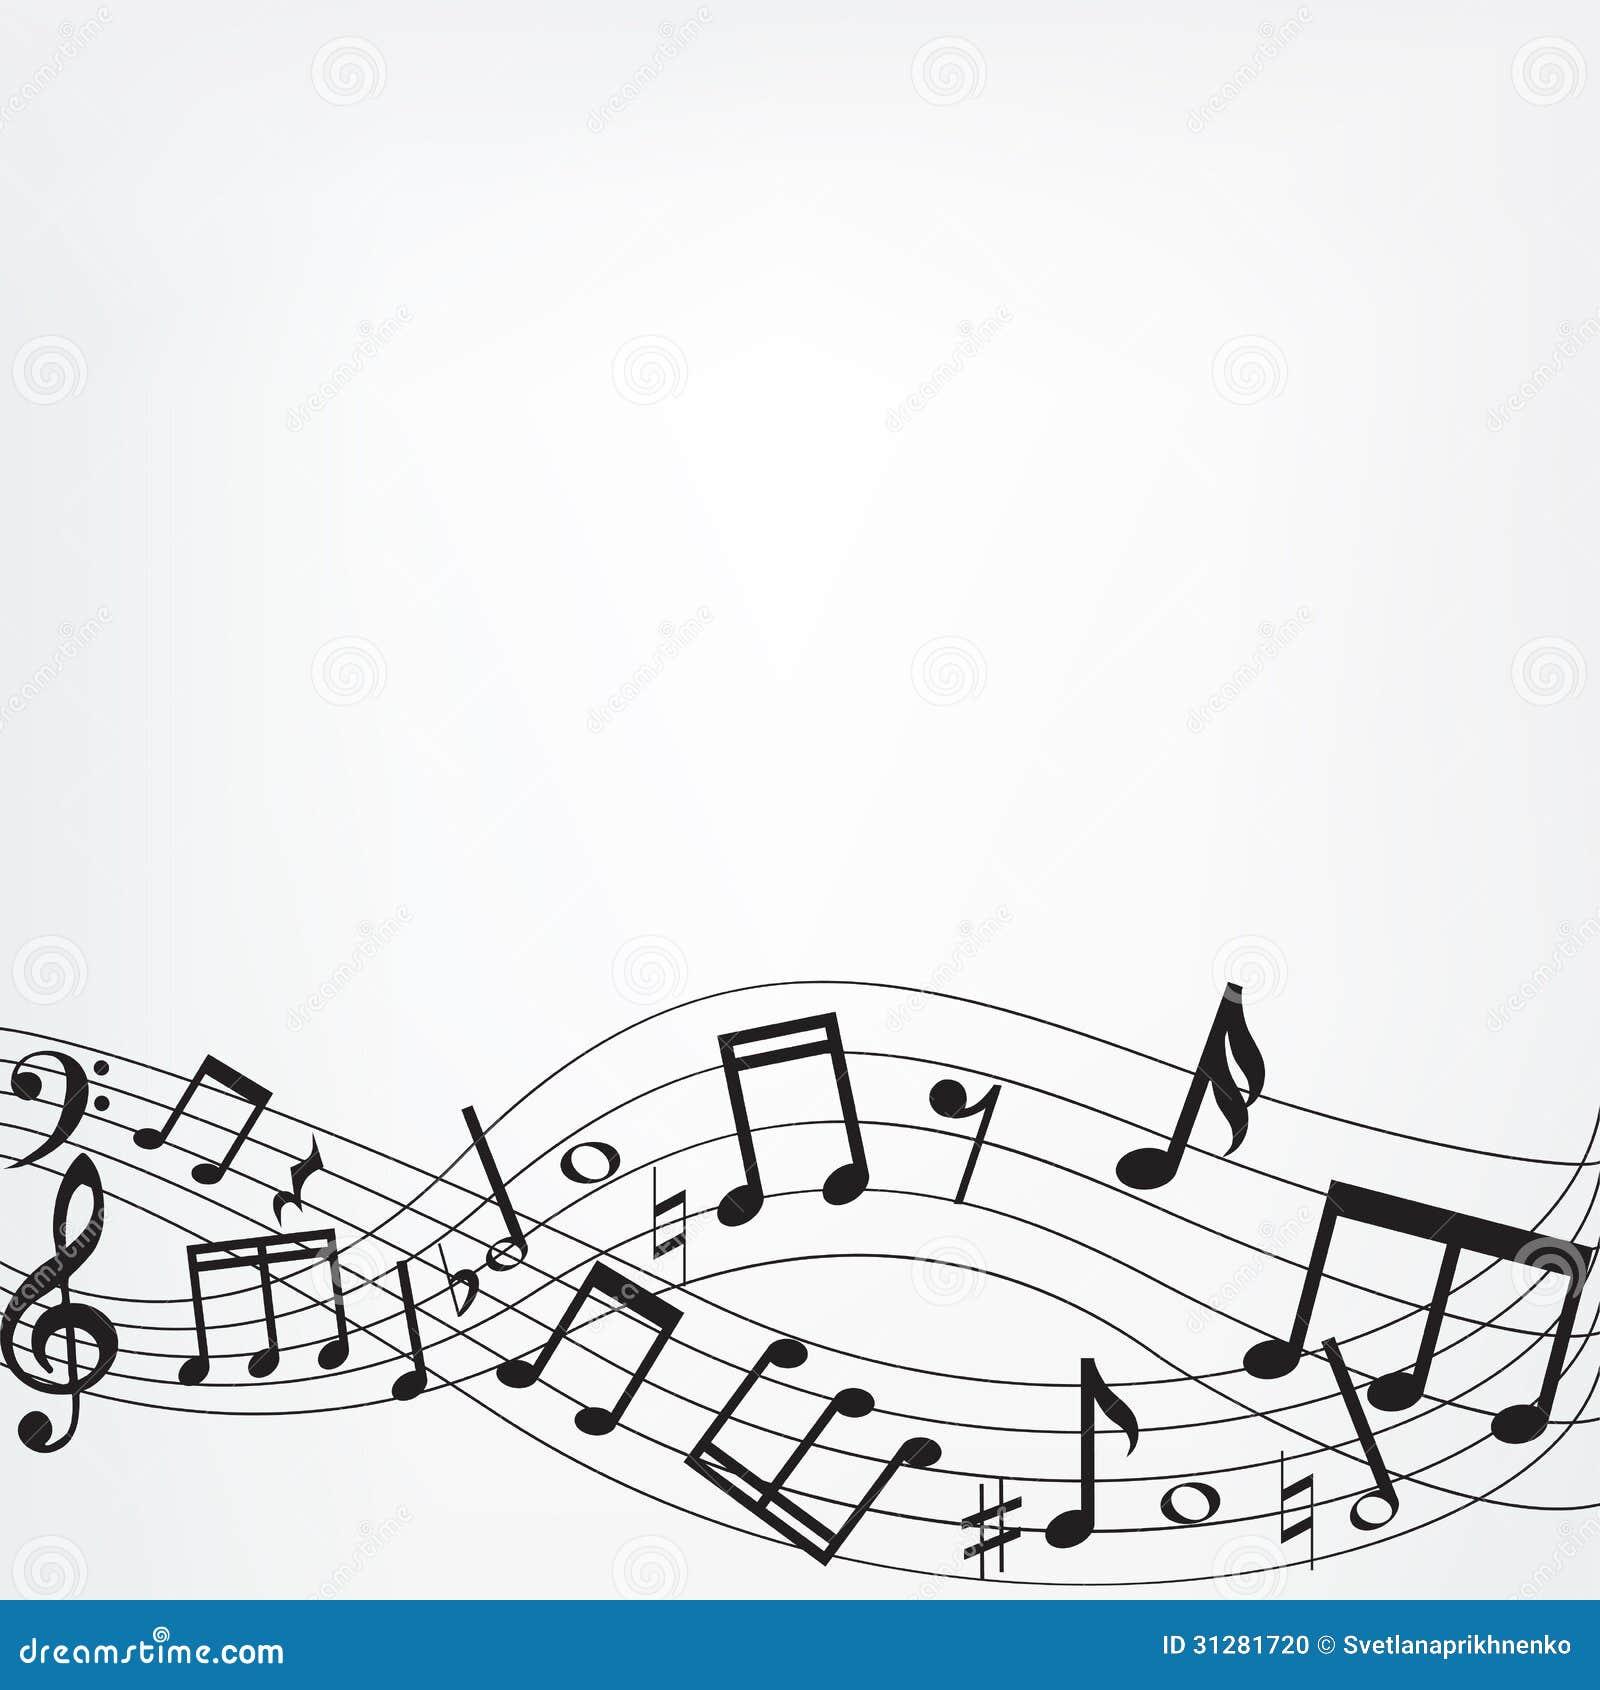 Music Notes Border Frame Stock Illustrations 748 Music Notes